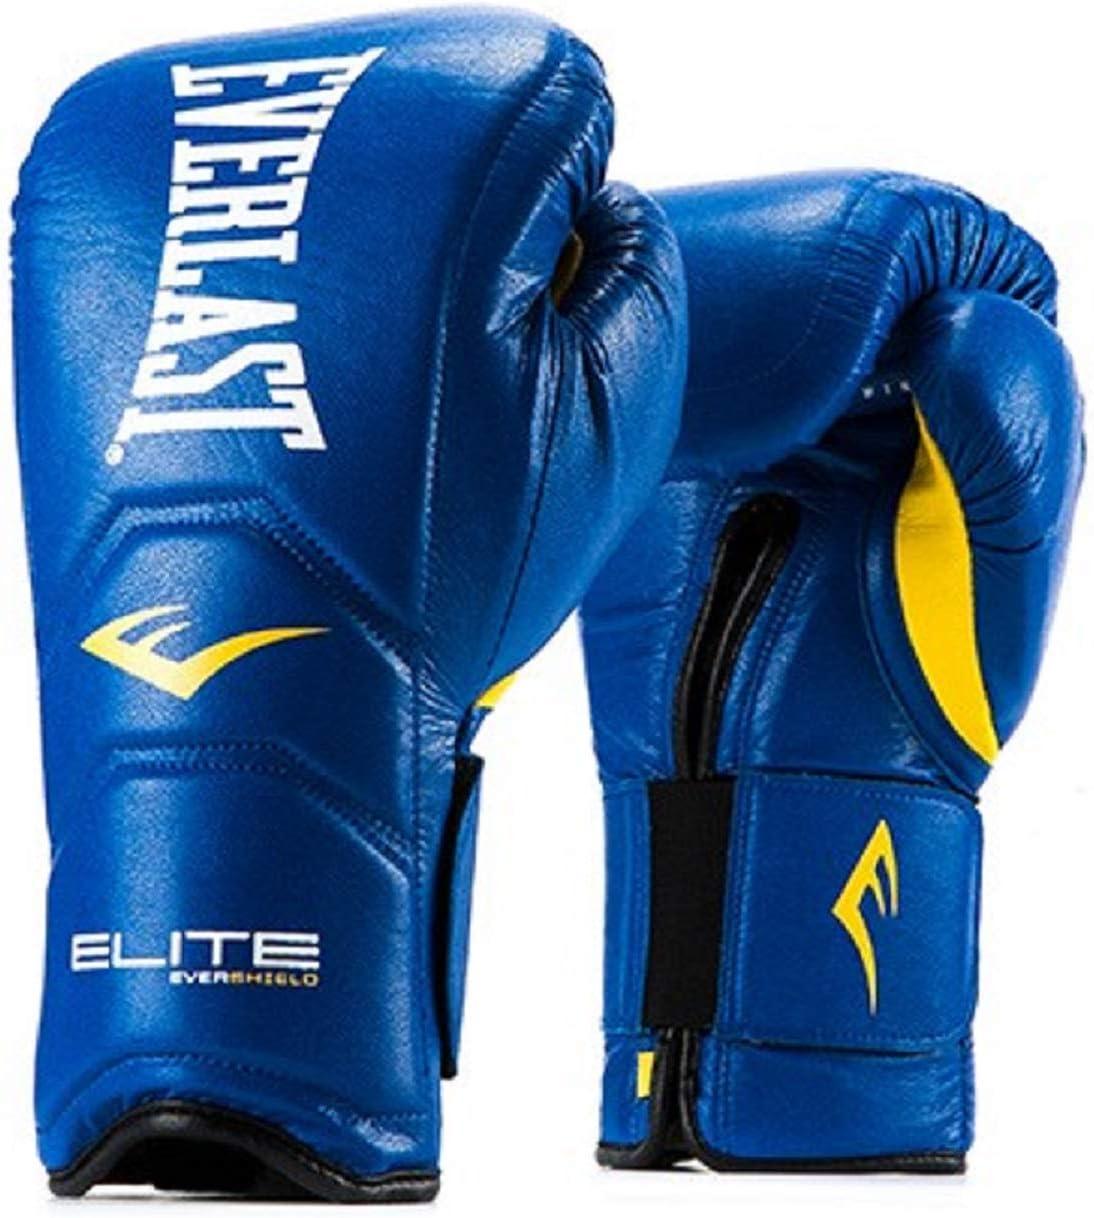 Everlast Max 53% OFF Elite Super popular specialty store Hook Loop Gloves Training